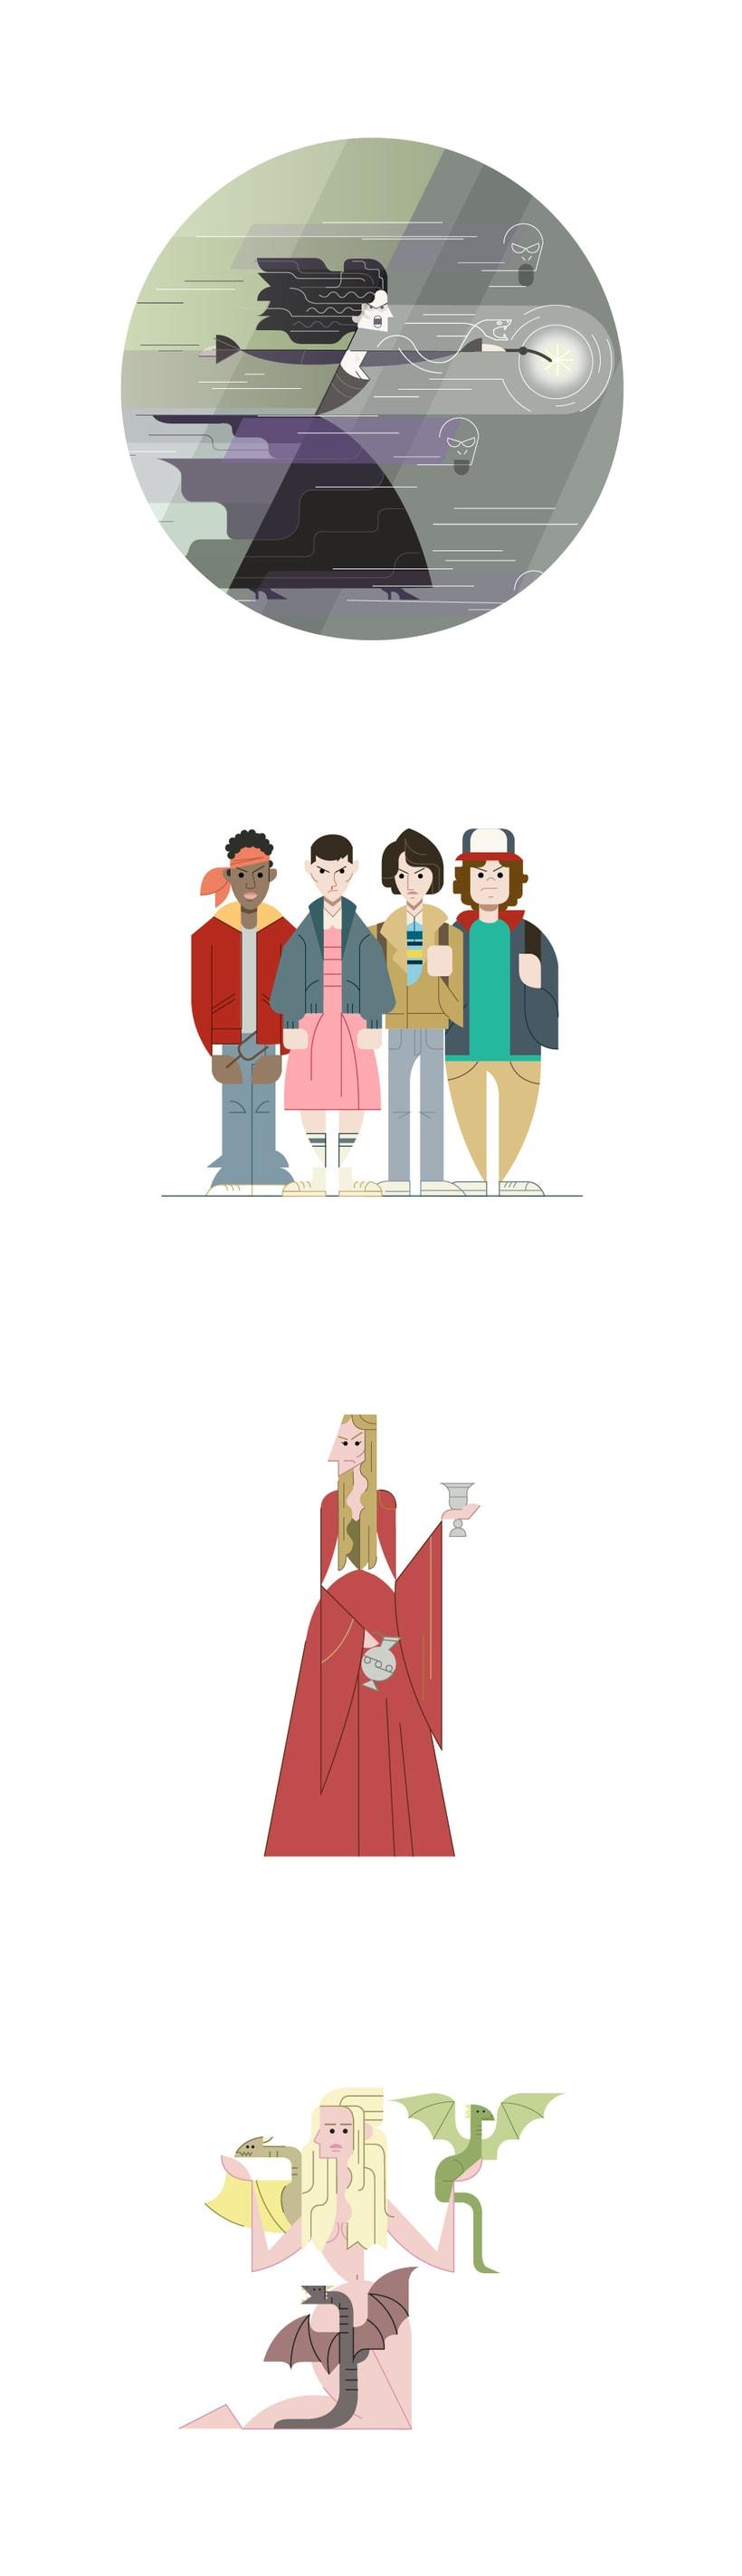 Diseño de personajes para el character design challenge 2